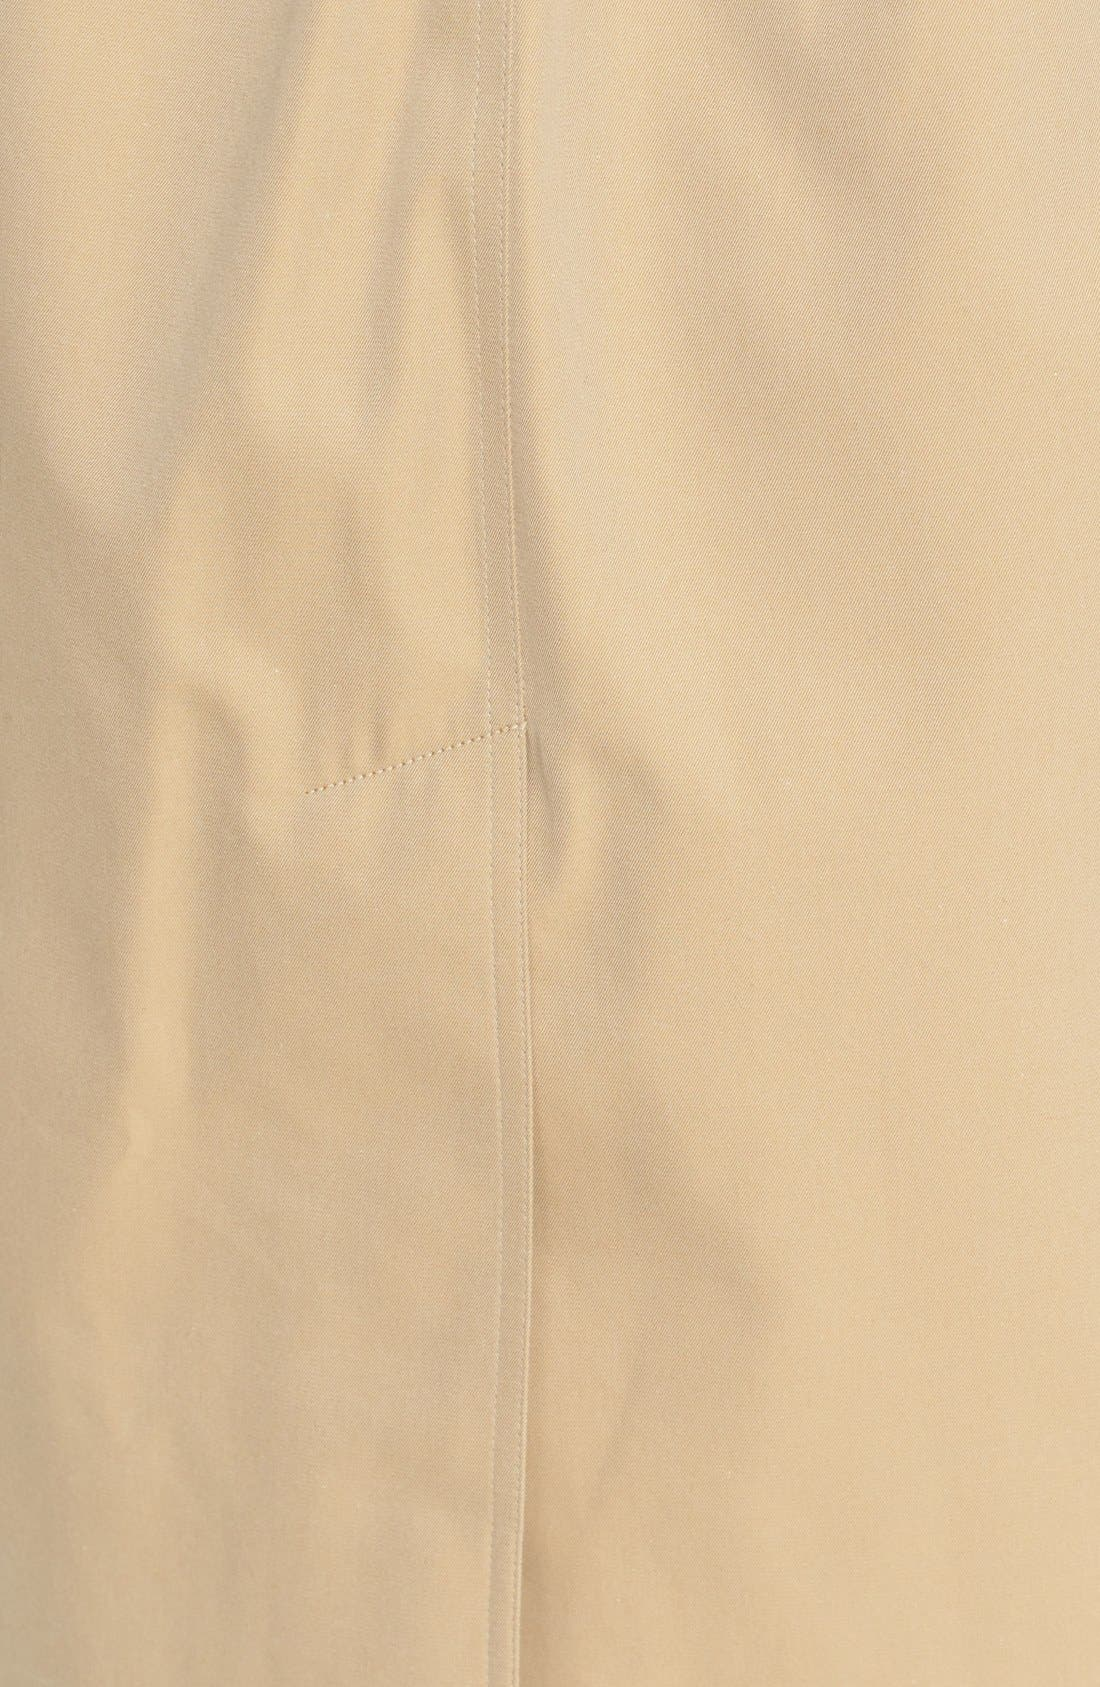 BURBERRY, Kensington Long Trench Coat, Alternate thumbnail 4, color, HONEY